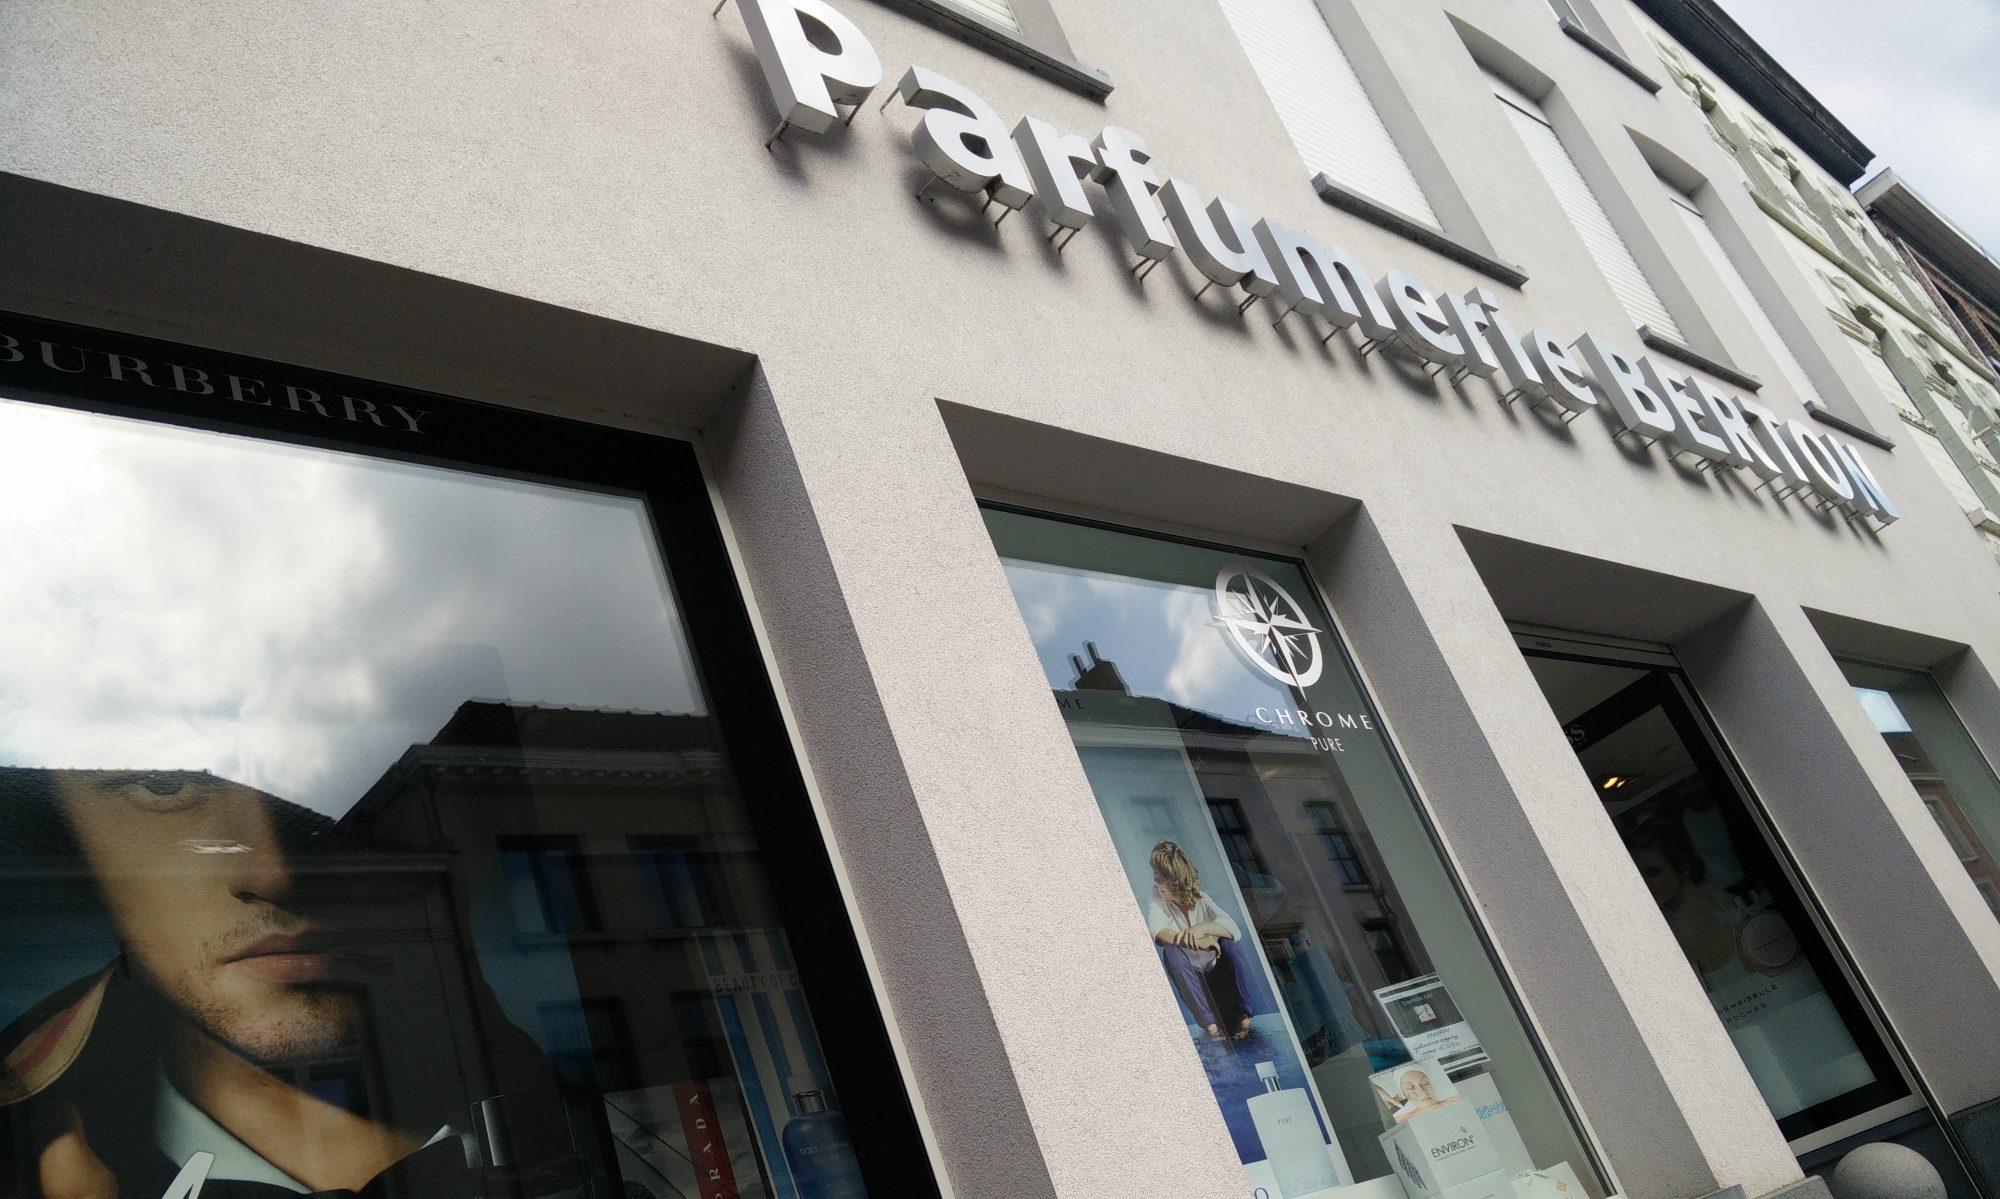 Parfumerie Berton